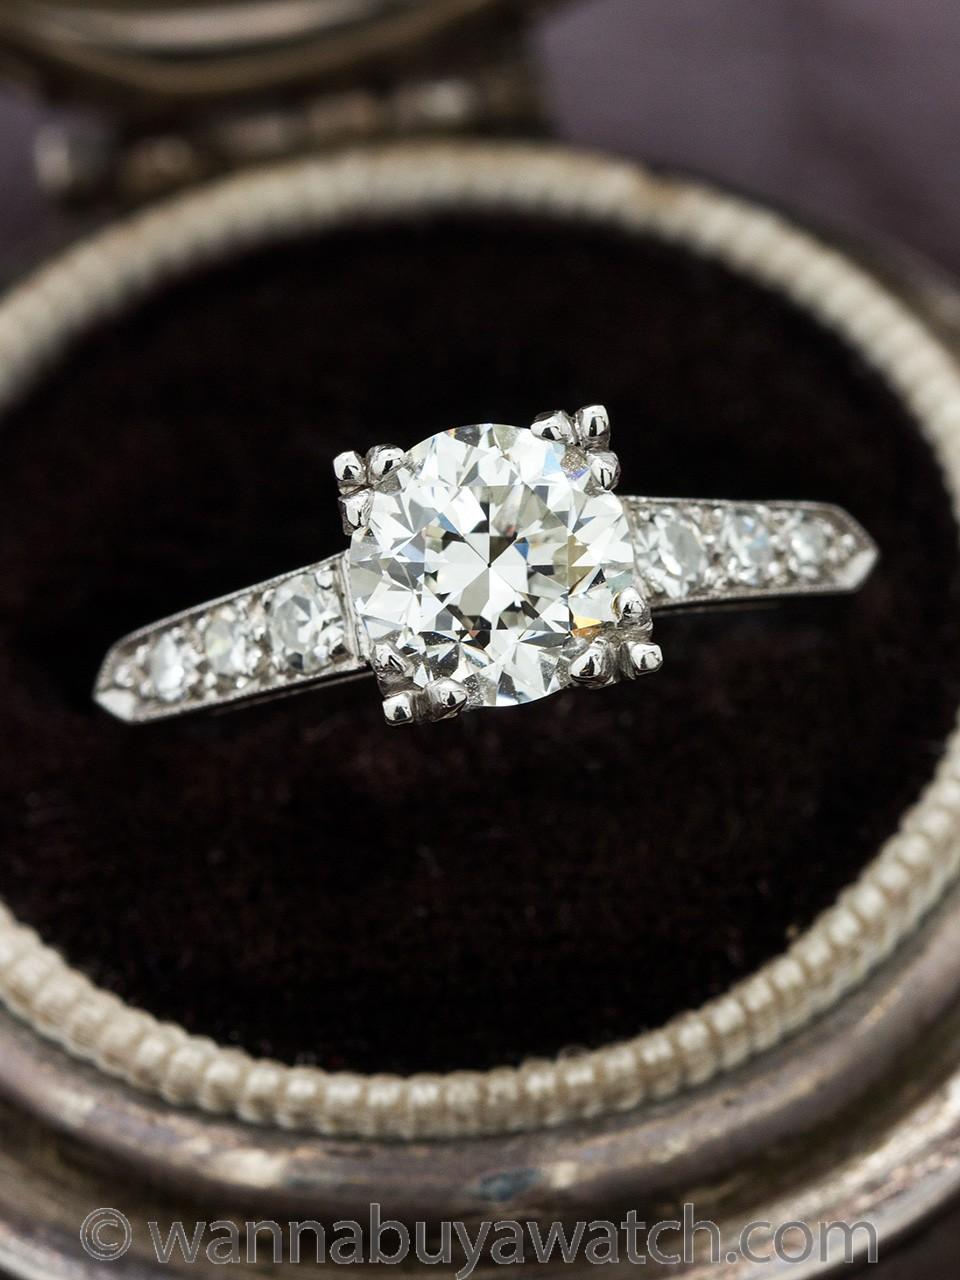 Vintage Engagement Ring Platinum 1.27 Carat Transitional Cut H-VS1, circa 1940s